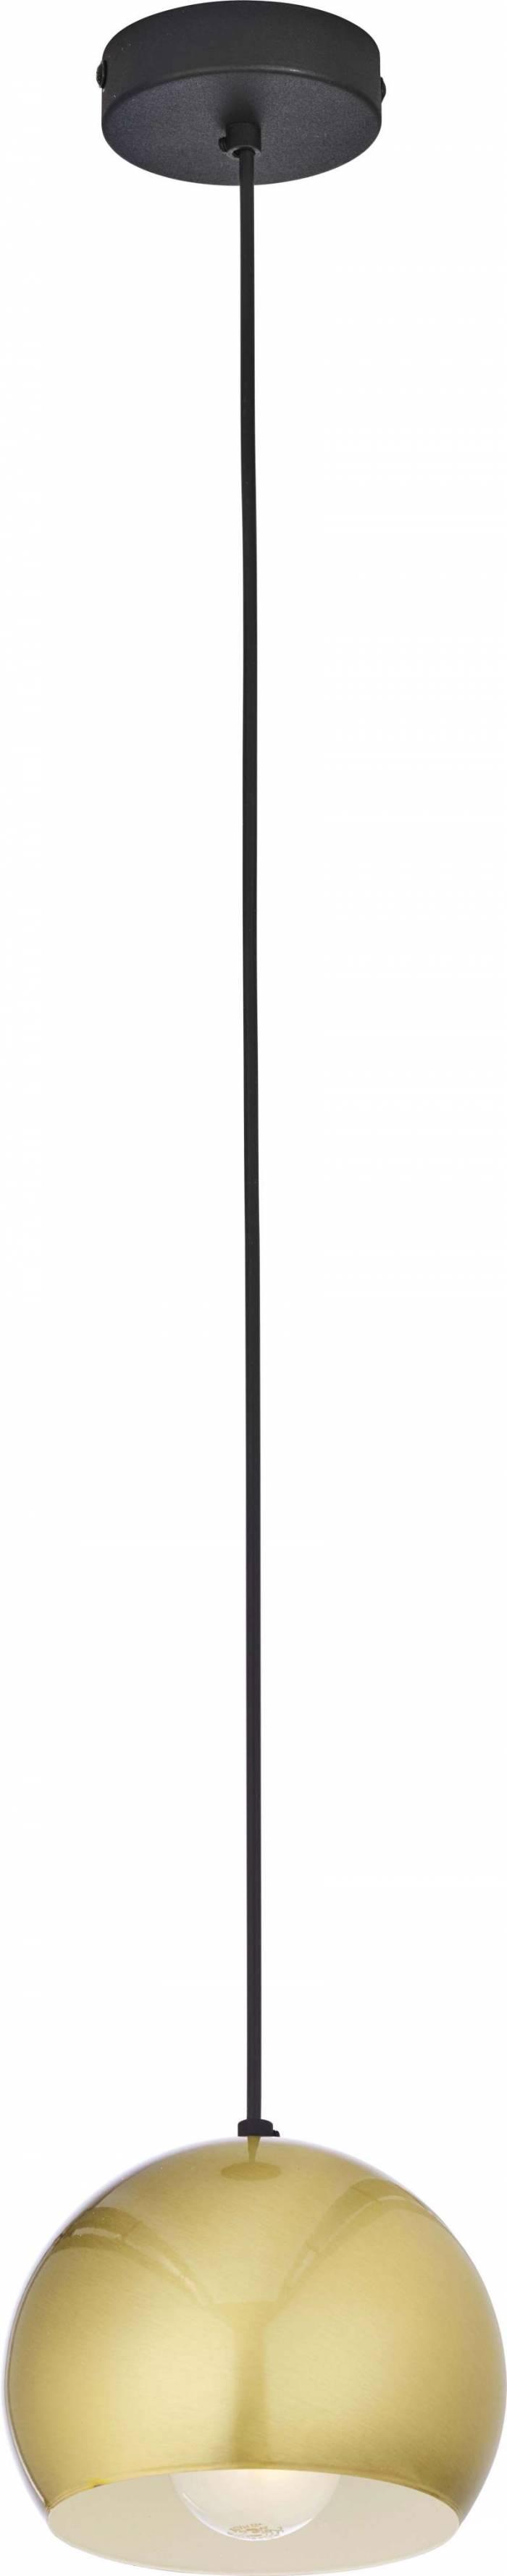 Lustră pendul Spencer, 105x17x17 cm, metal, auriu/ alb/ negru